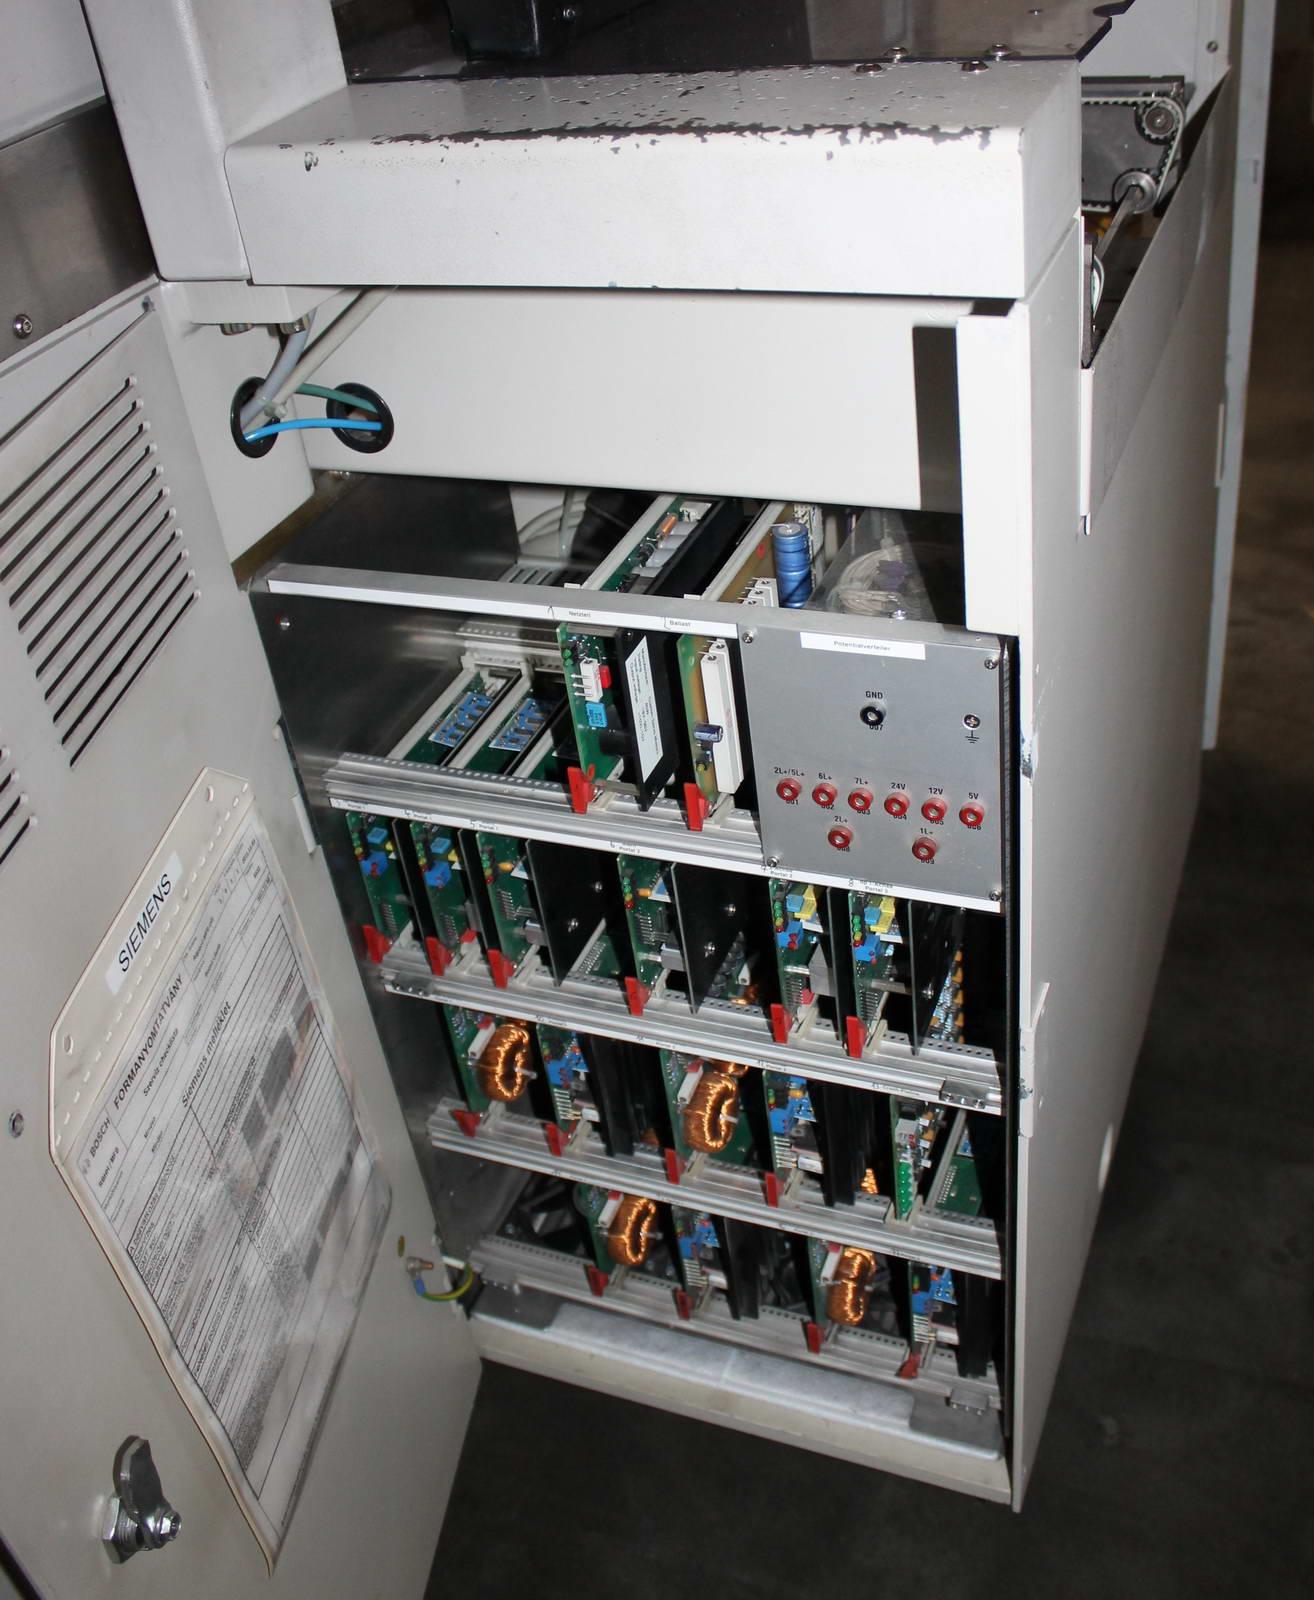 Siemens automatic implanter